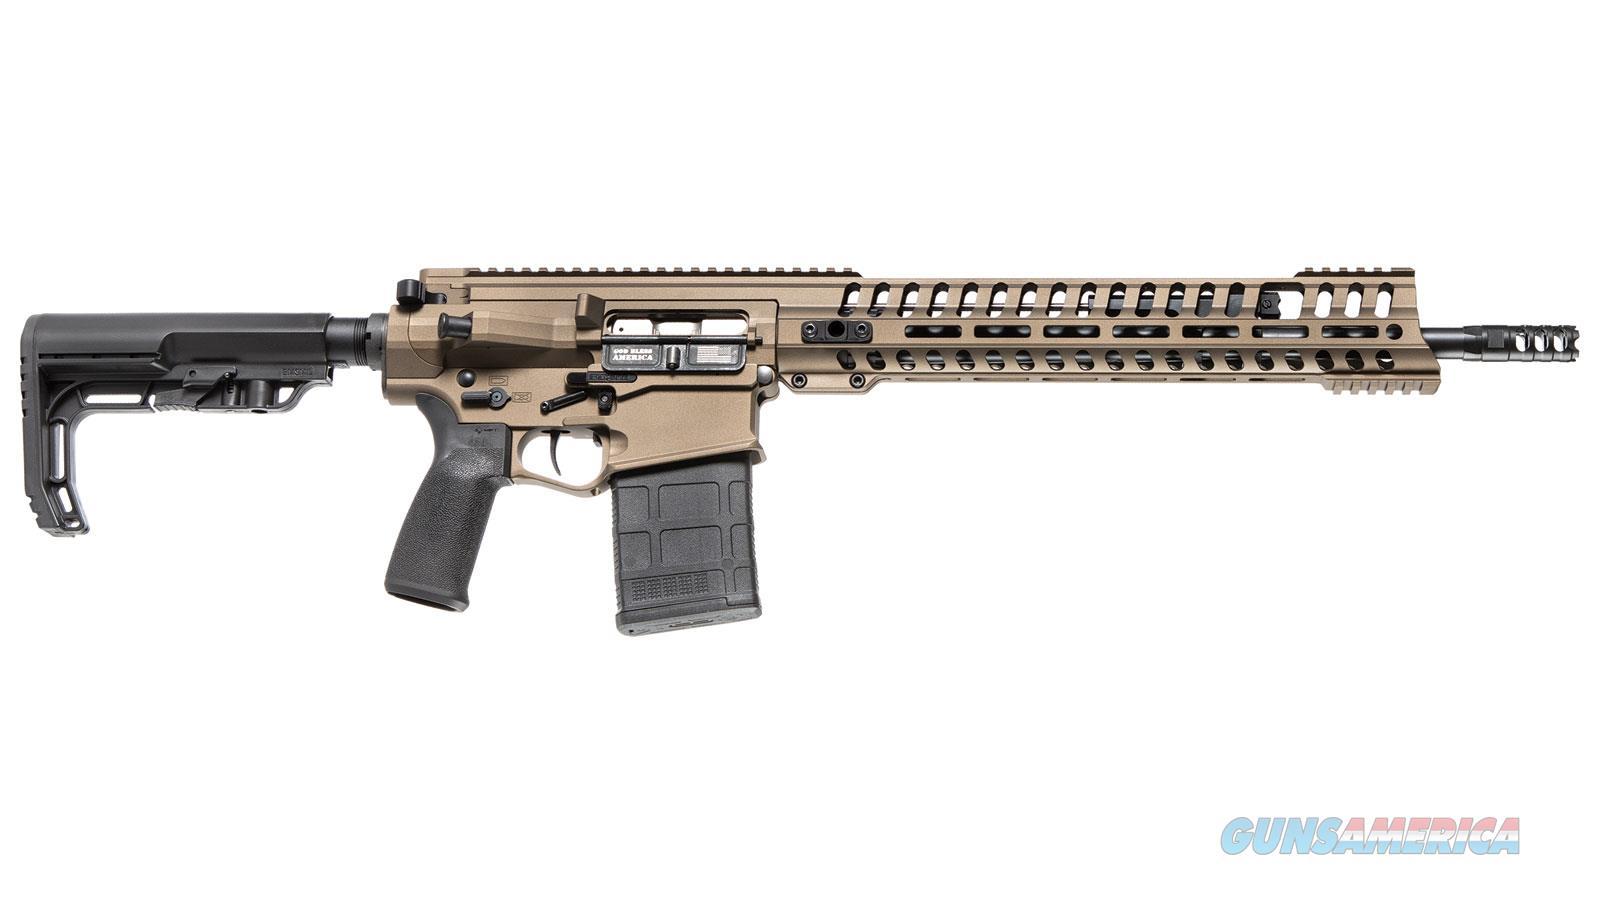 Patriot Ordnance Factory G4 P308 308Win 16.5 Mlok Mrr Rail Brnt Brnz 01210  Guns > Rifles > PQ Misc Rifles